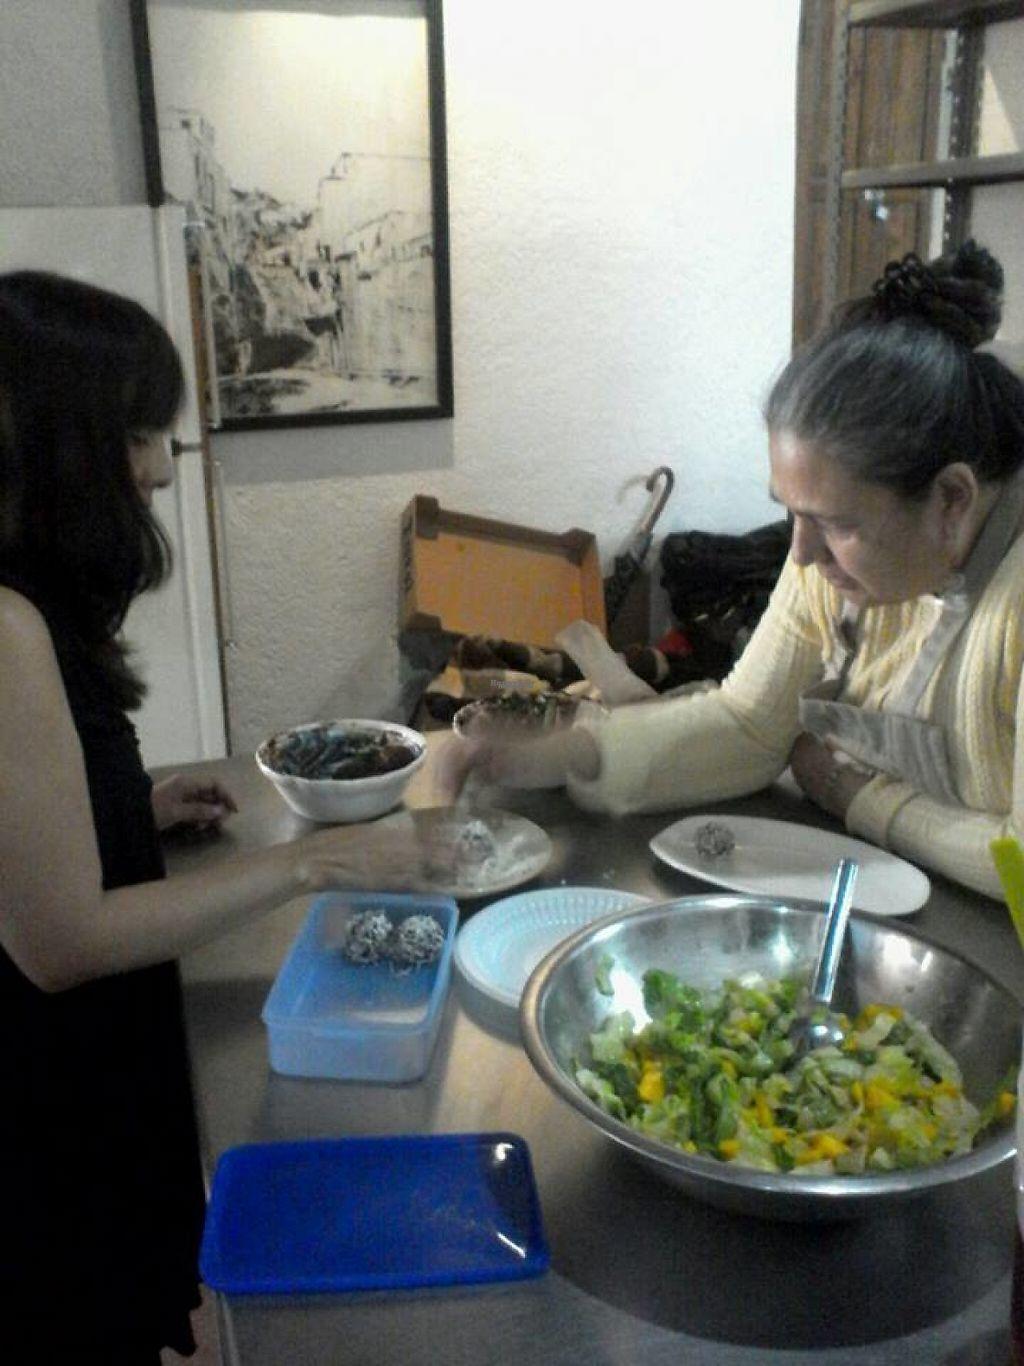 "Photo of Come Sano  by <a href=""/members/profile/Saravit"">Saravit</a> <br/>Clases de Cocina Vegana Mexicana, Induú,Internacional,Reposteria,Panaderia Artesanal,Elaboración del Tofu  <br/> March 31, 2017  - <a href='/contact/abuse/image/74204/242962'>Report</a>"